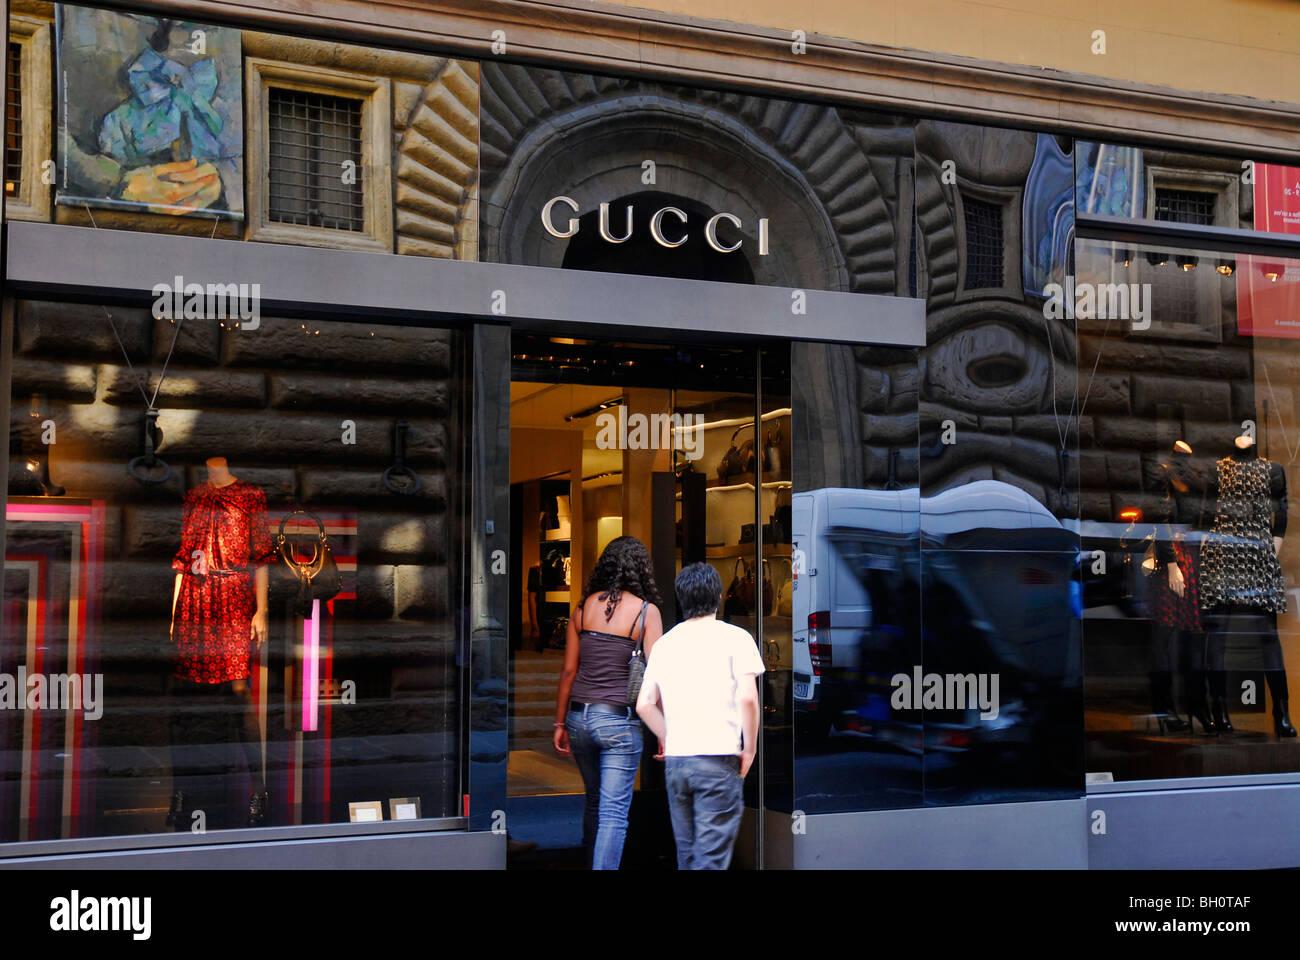 28141e6522c Menschen vor Designer Shop Gucci, Via dei Tornabuoni, Florenz, Toskana,  Italien, Europa